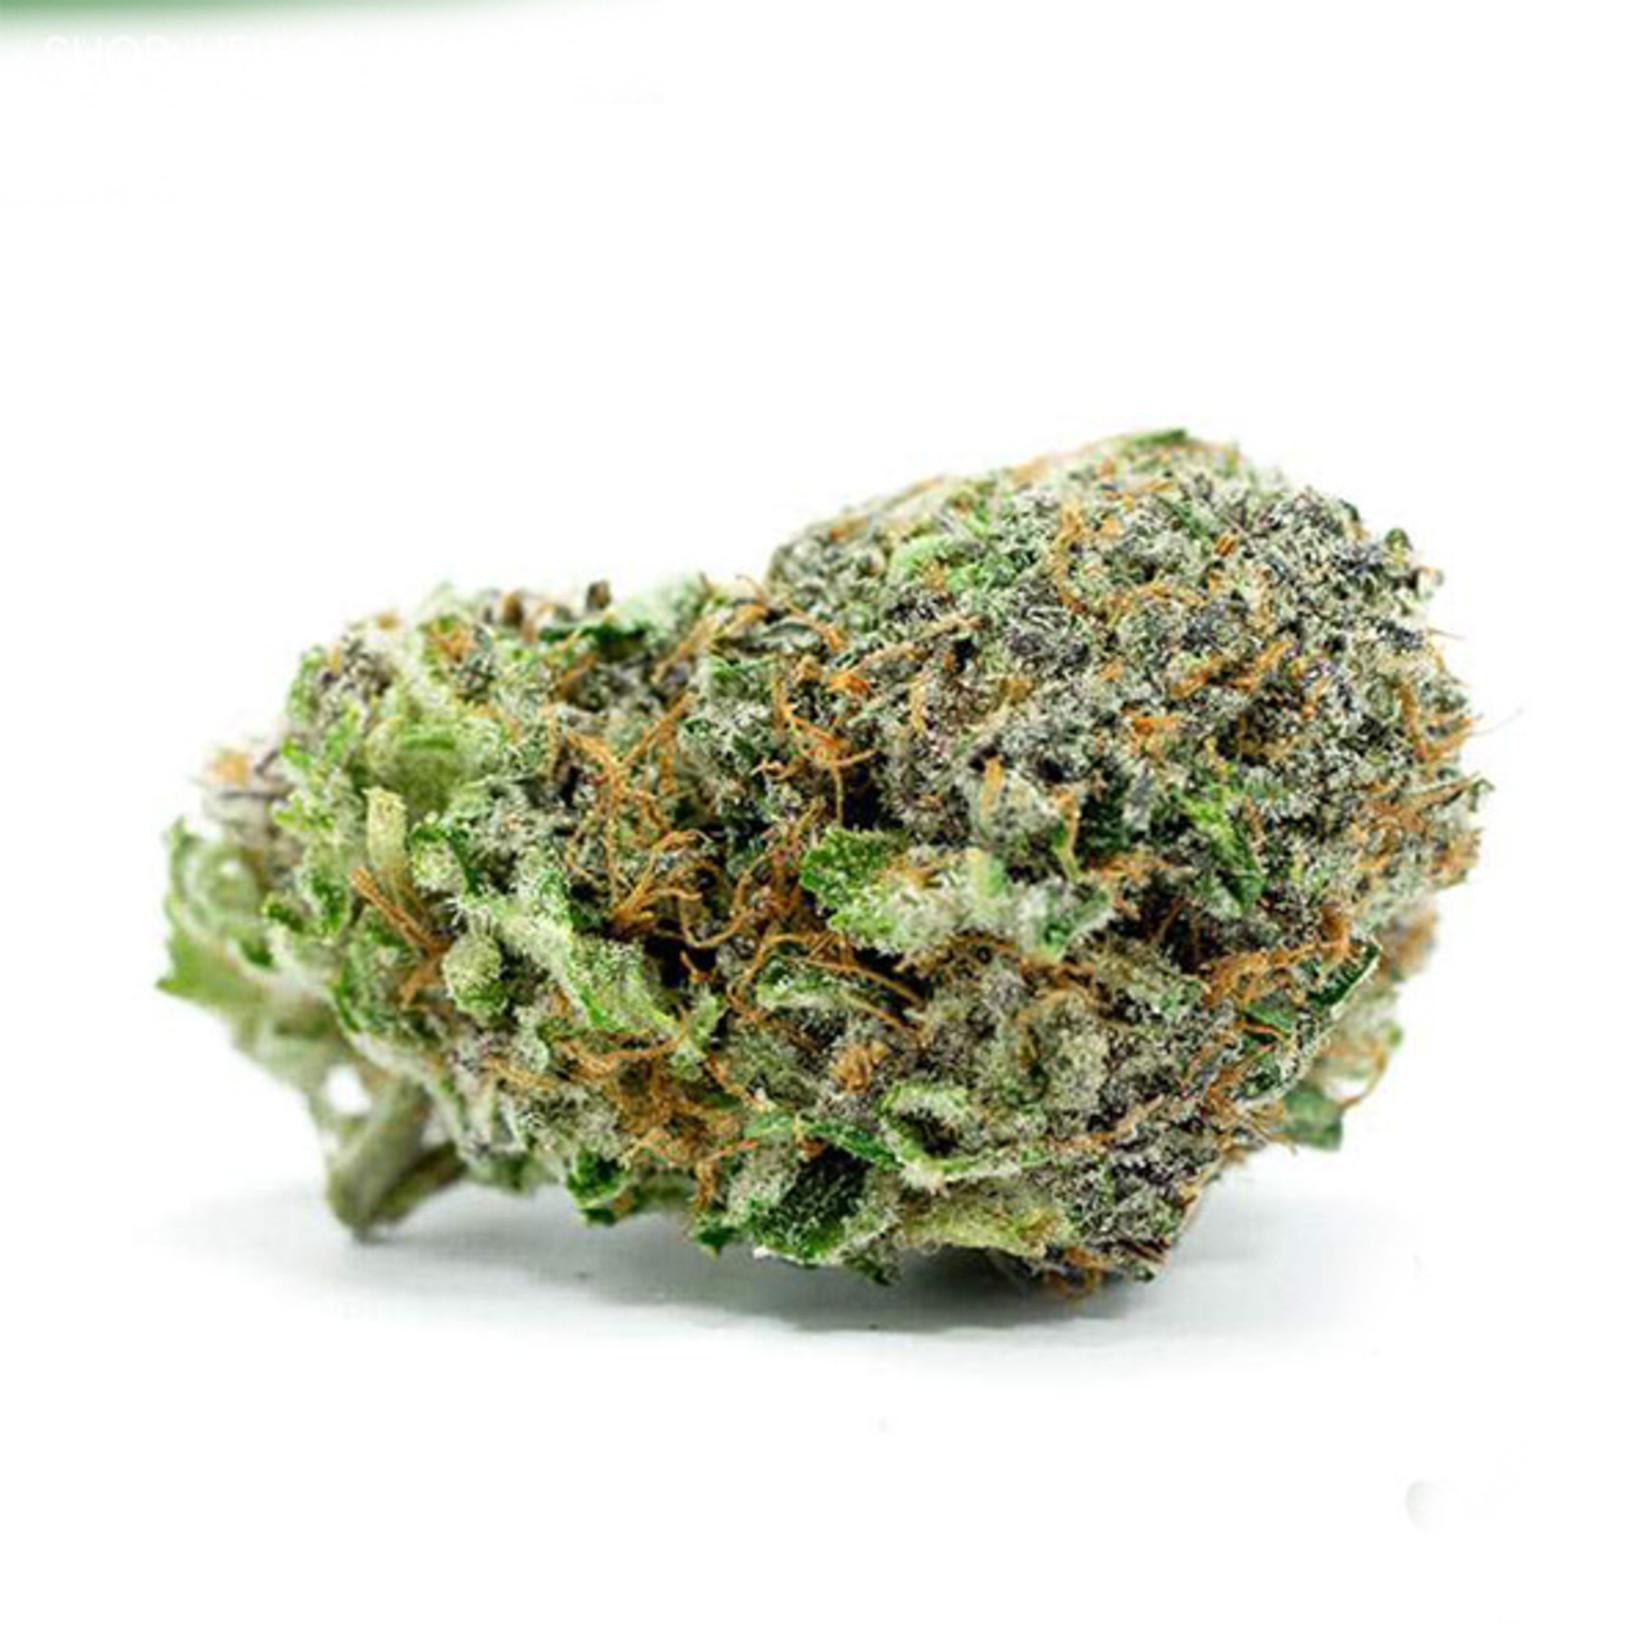 Green Crack Gorilla cannabis seeds